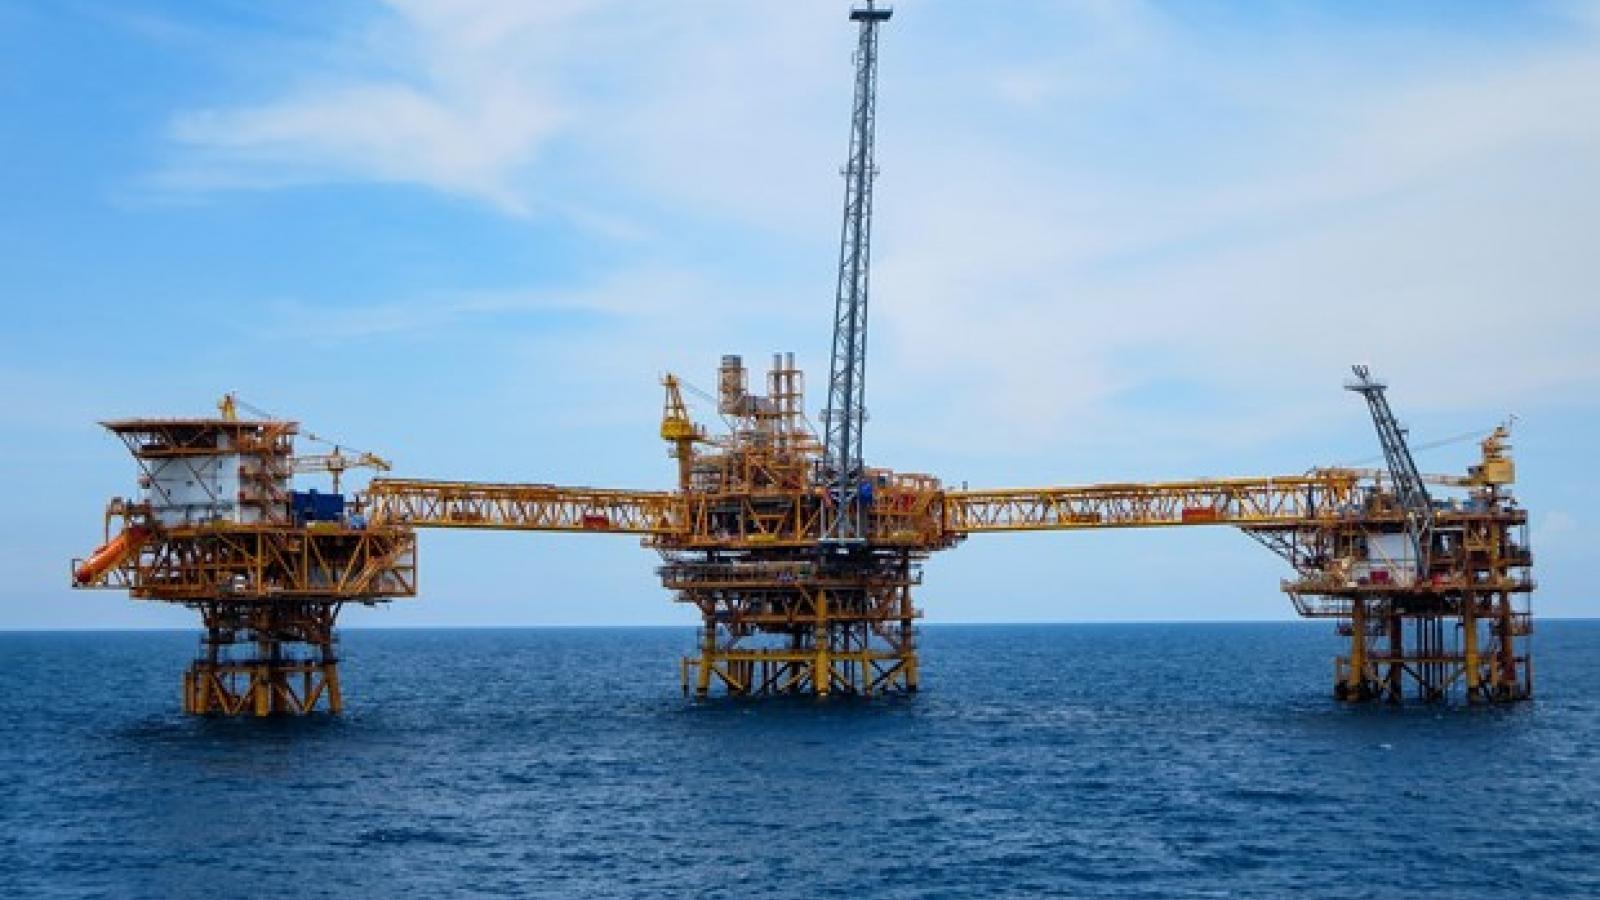 PetroVietnam exploits 7.76 million tonnes of oil equivalent in eight months